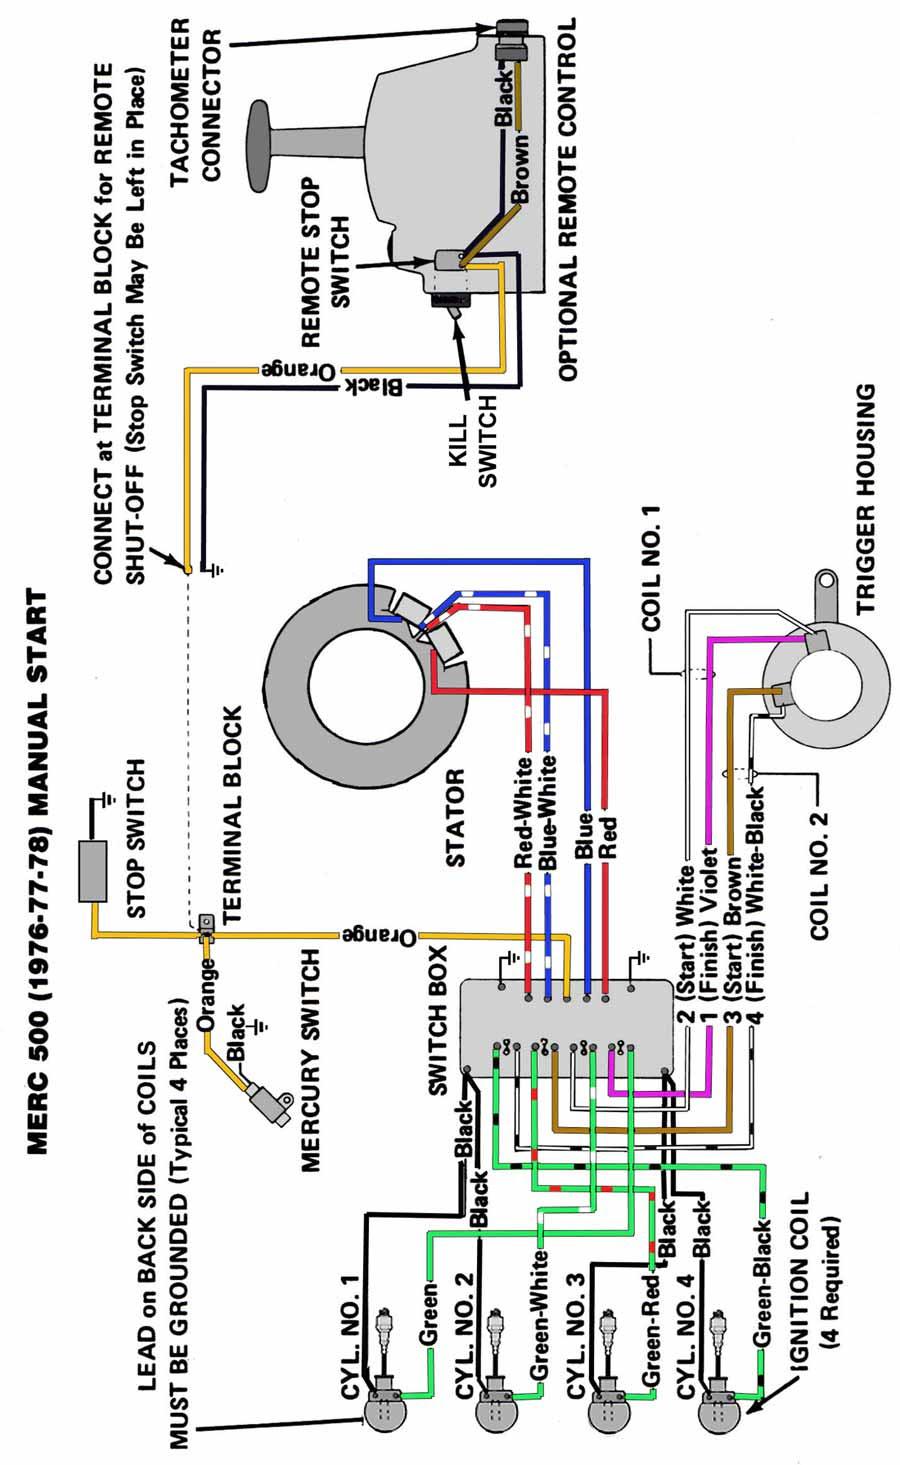 Diagram Kx 500 2 Stroke Stator Wiring Diagram Full Version Hd Quality Wiring Diagram Skematik110isi Gsdportotorres It